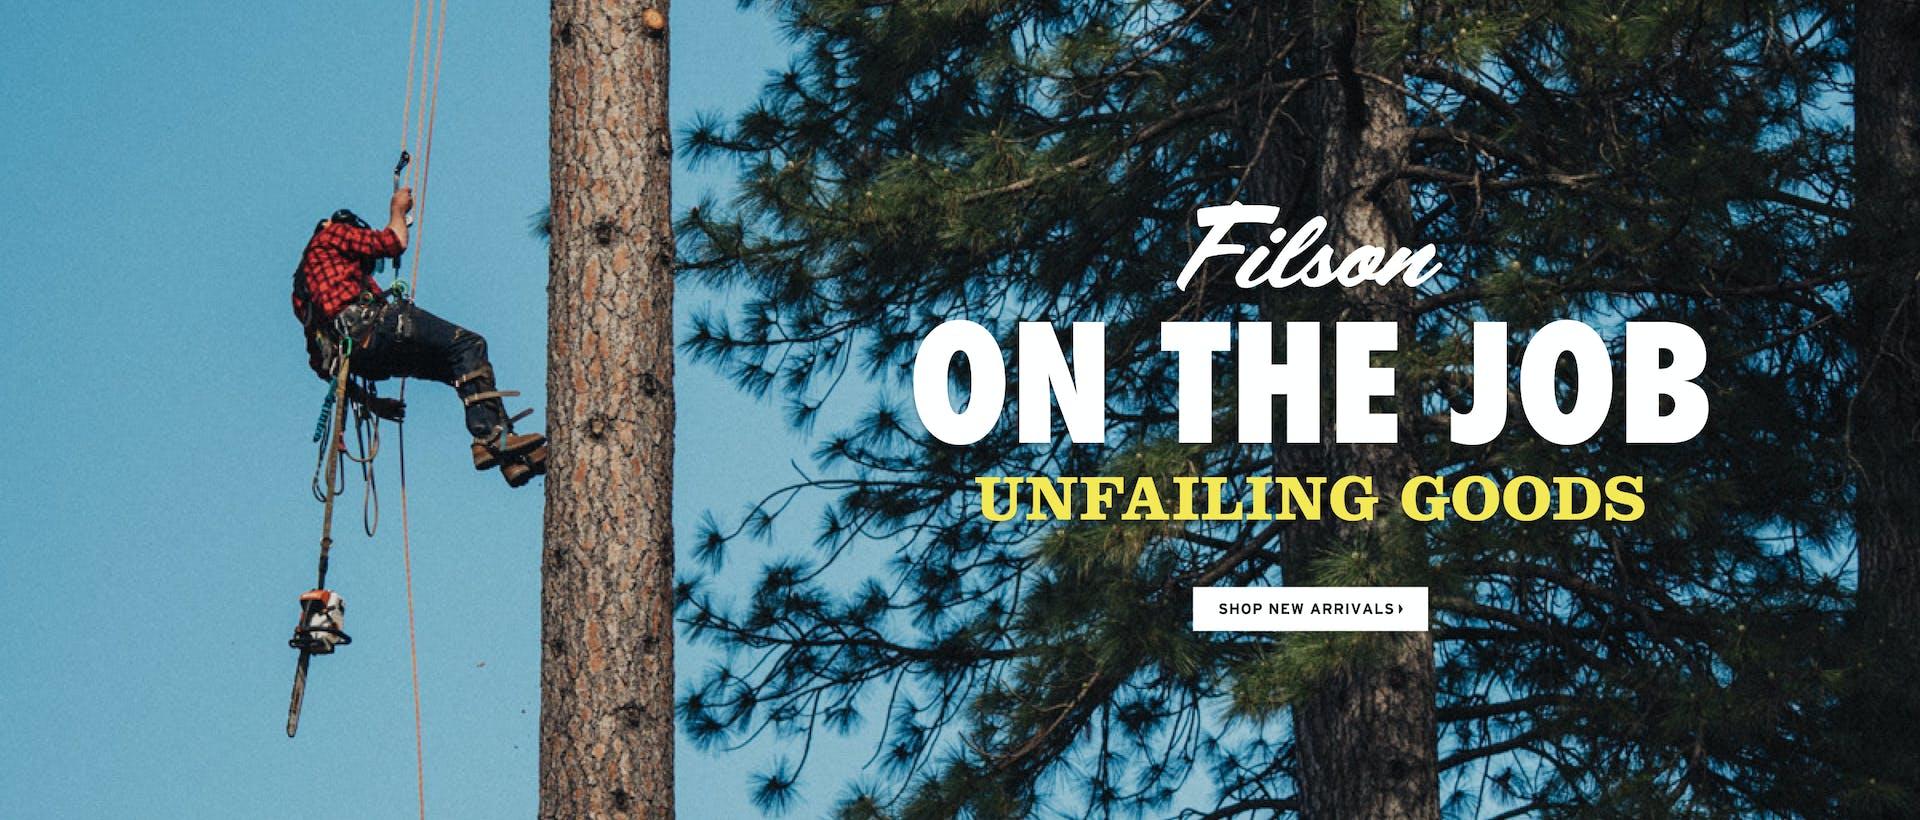 Filson Gear with Purpose Unfailing Goods Shop New Arrivals